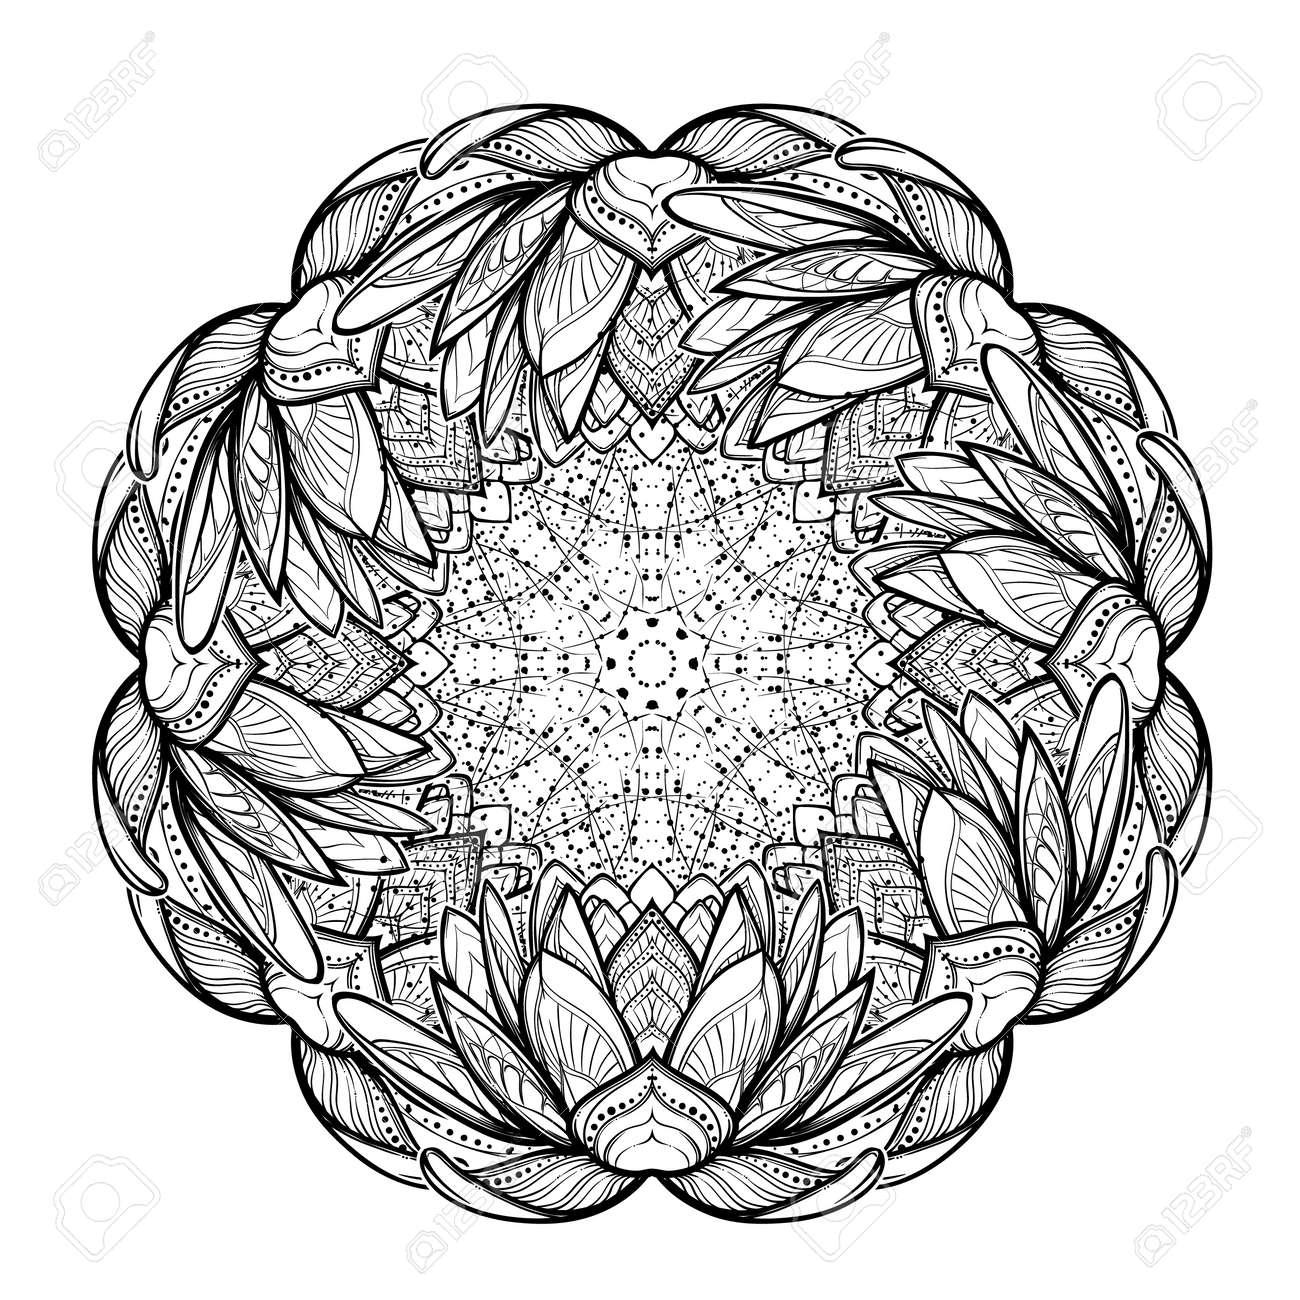 Lotus flower mandala intricate stylized linear drawing isolated lotus flower mandala intricate stylized linear drawing isolated on white background concept art for izmirmasajfo Gallery